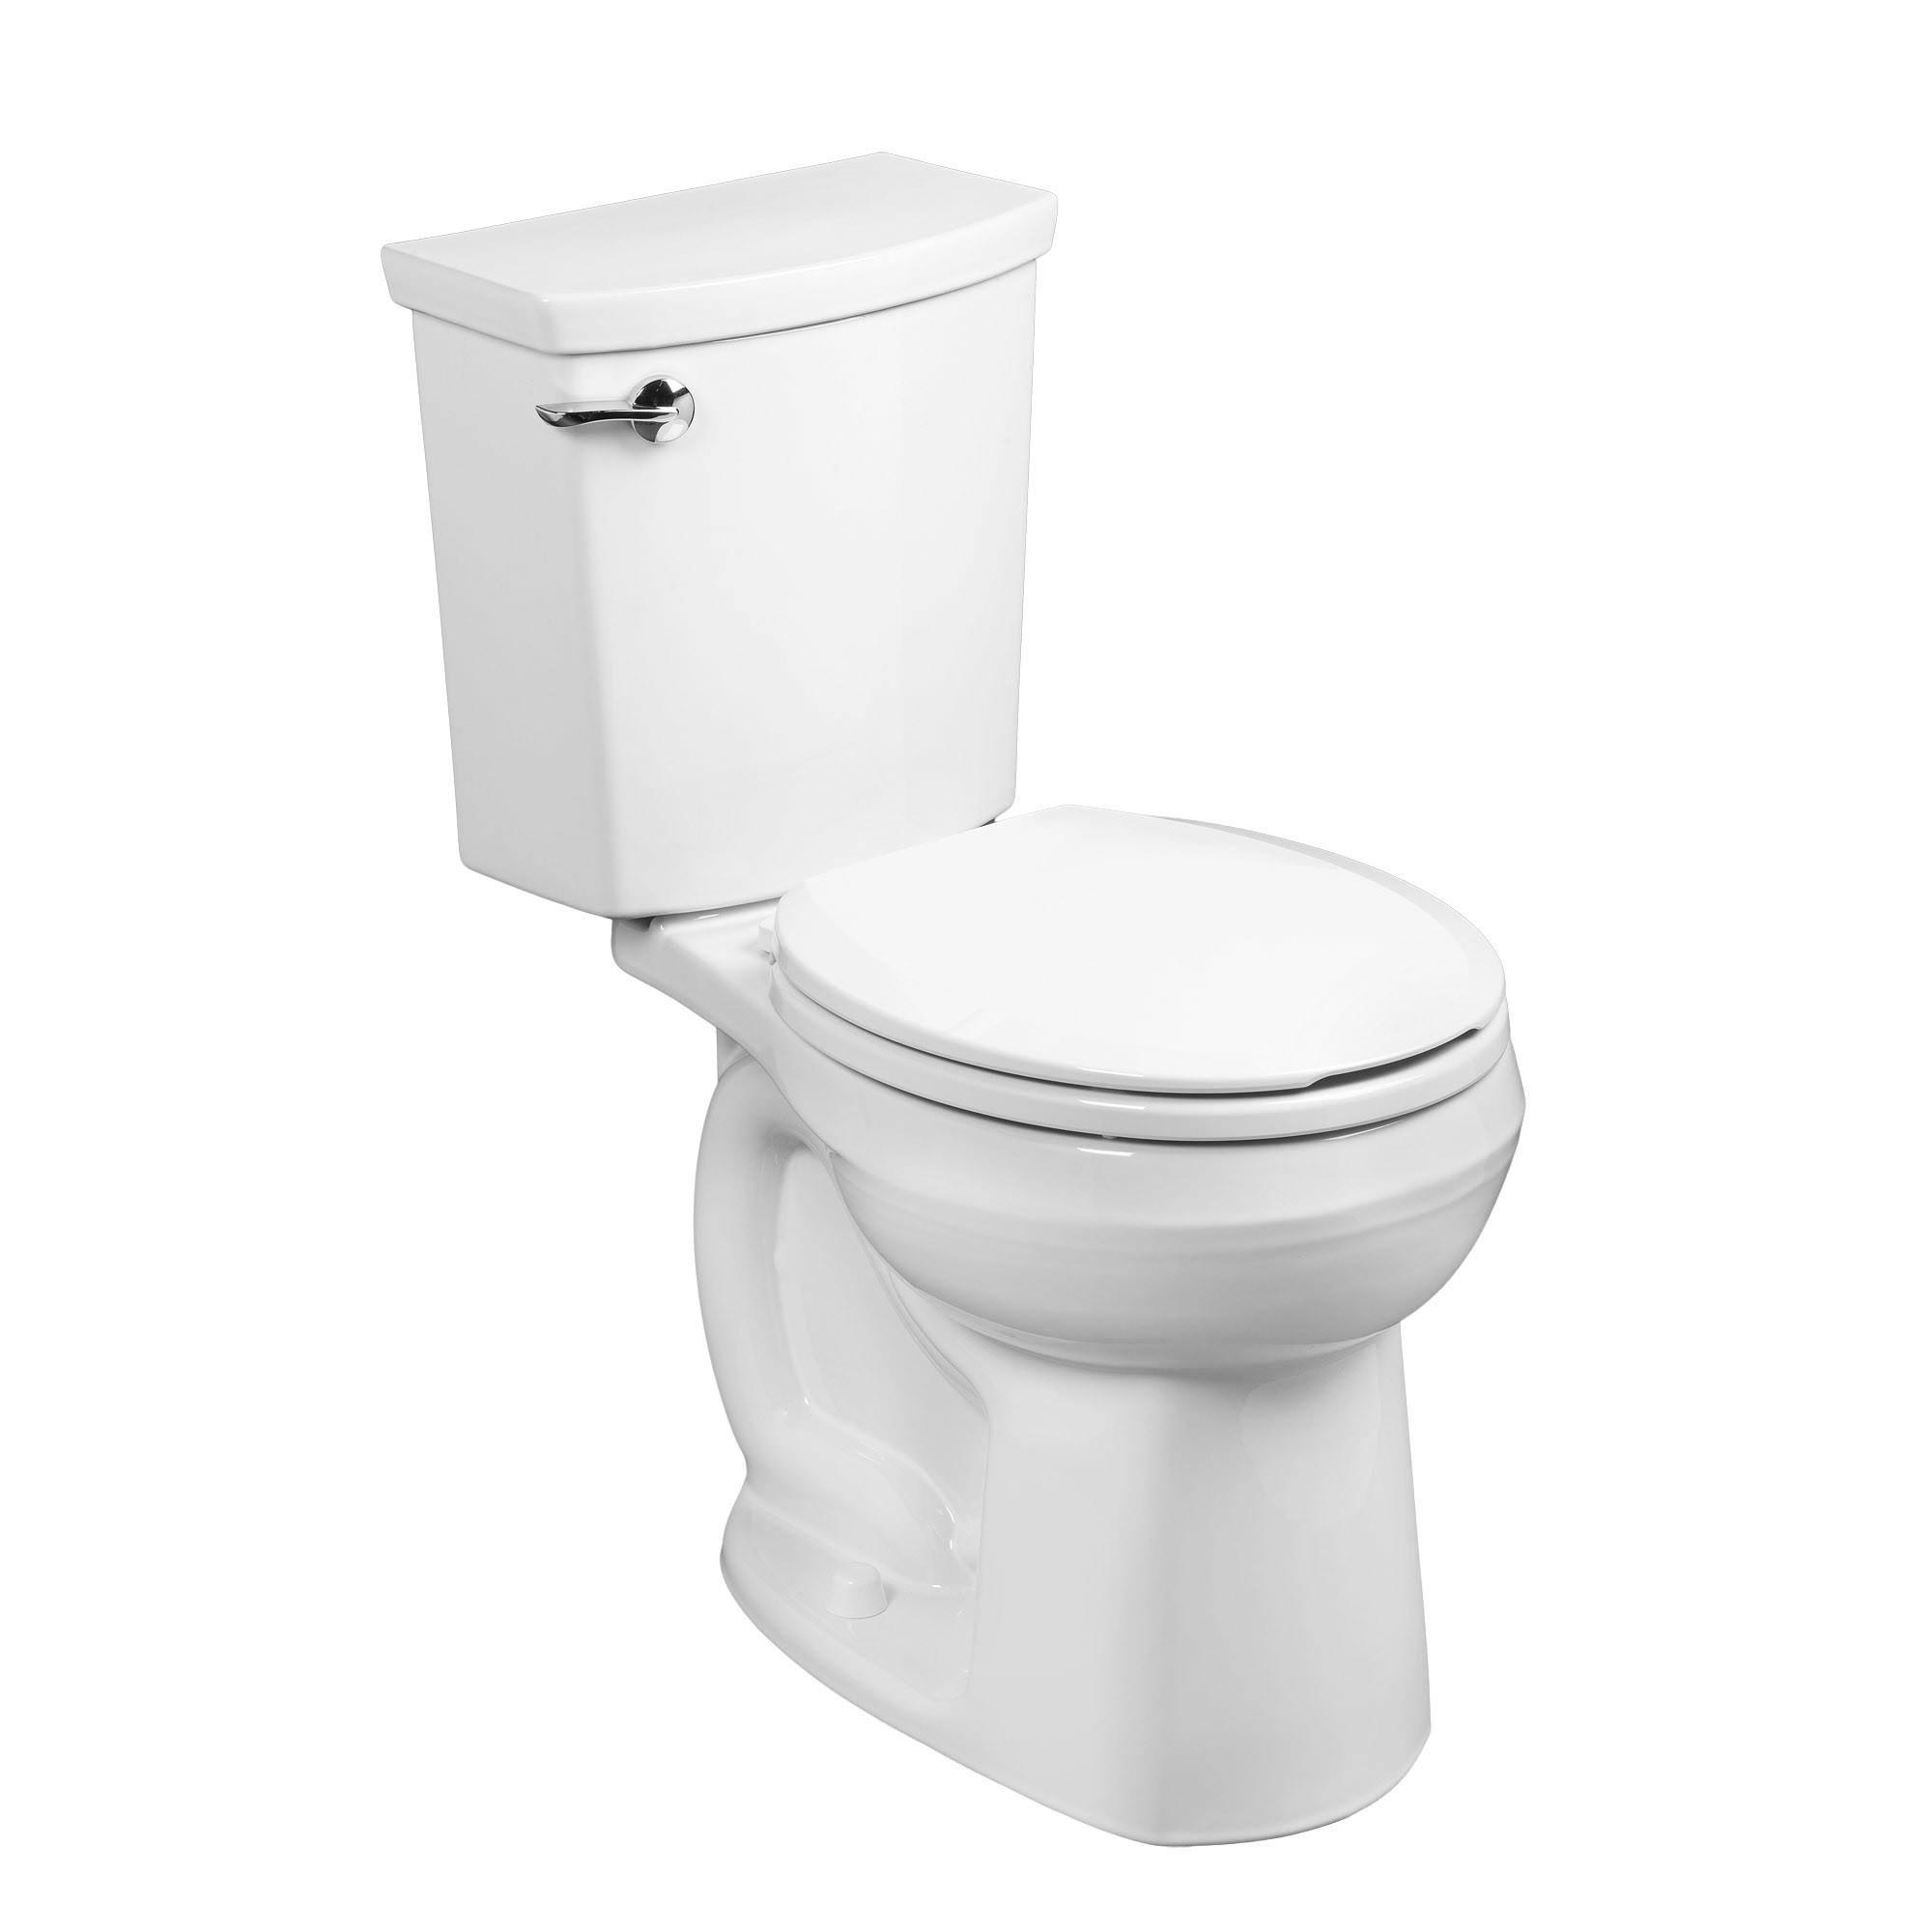 2691004 020 In White By American Standard: American Standard 288CA.114.020 H2Optimum Single Flush